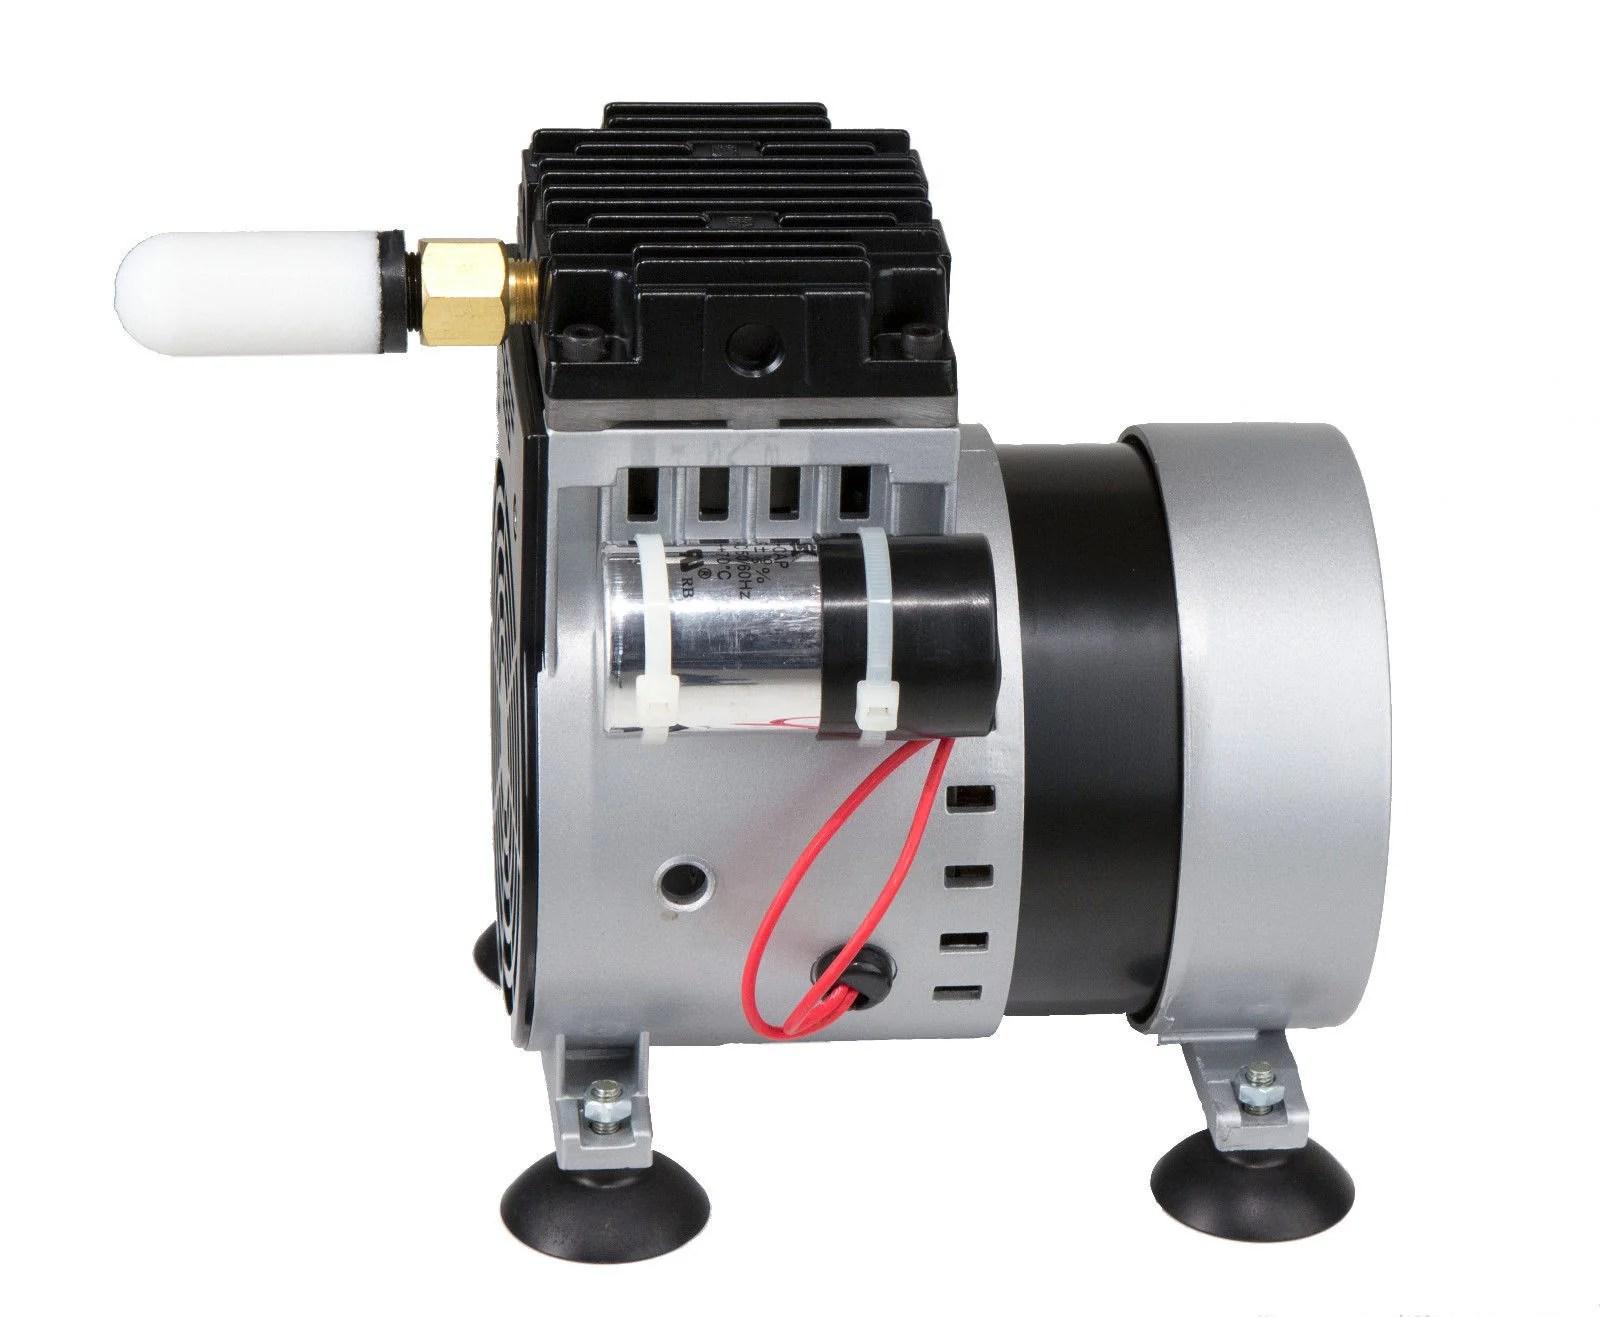 hight resolution of  easypro 1 4 hp rocking piston pond aerator air compressor erp25